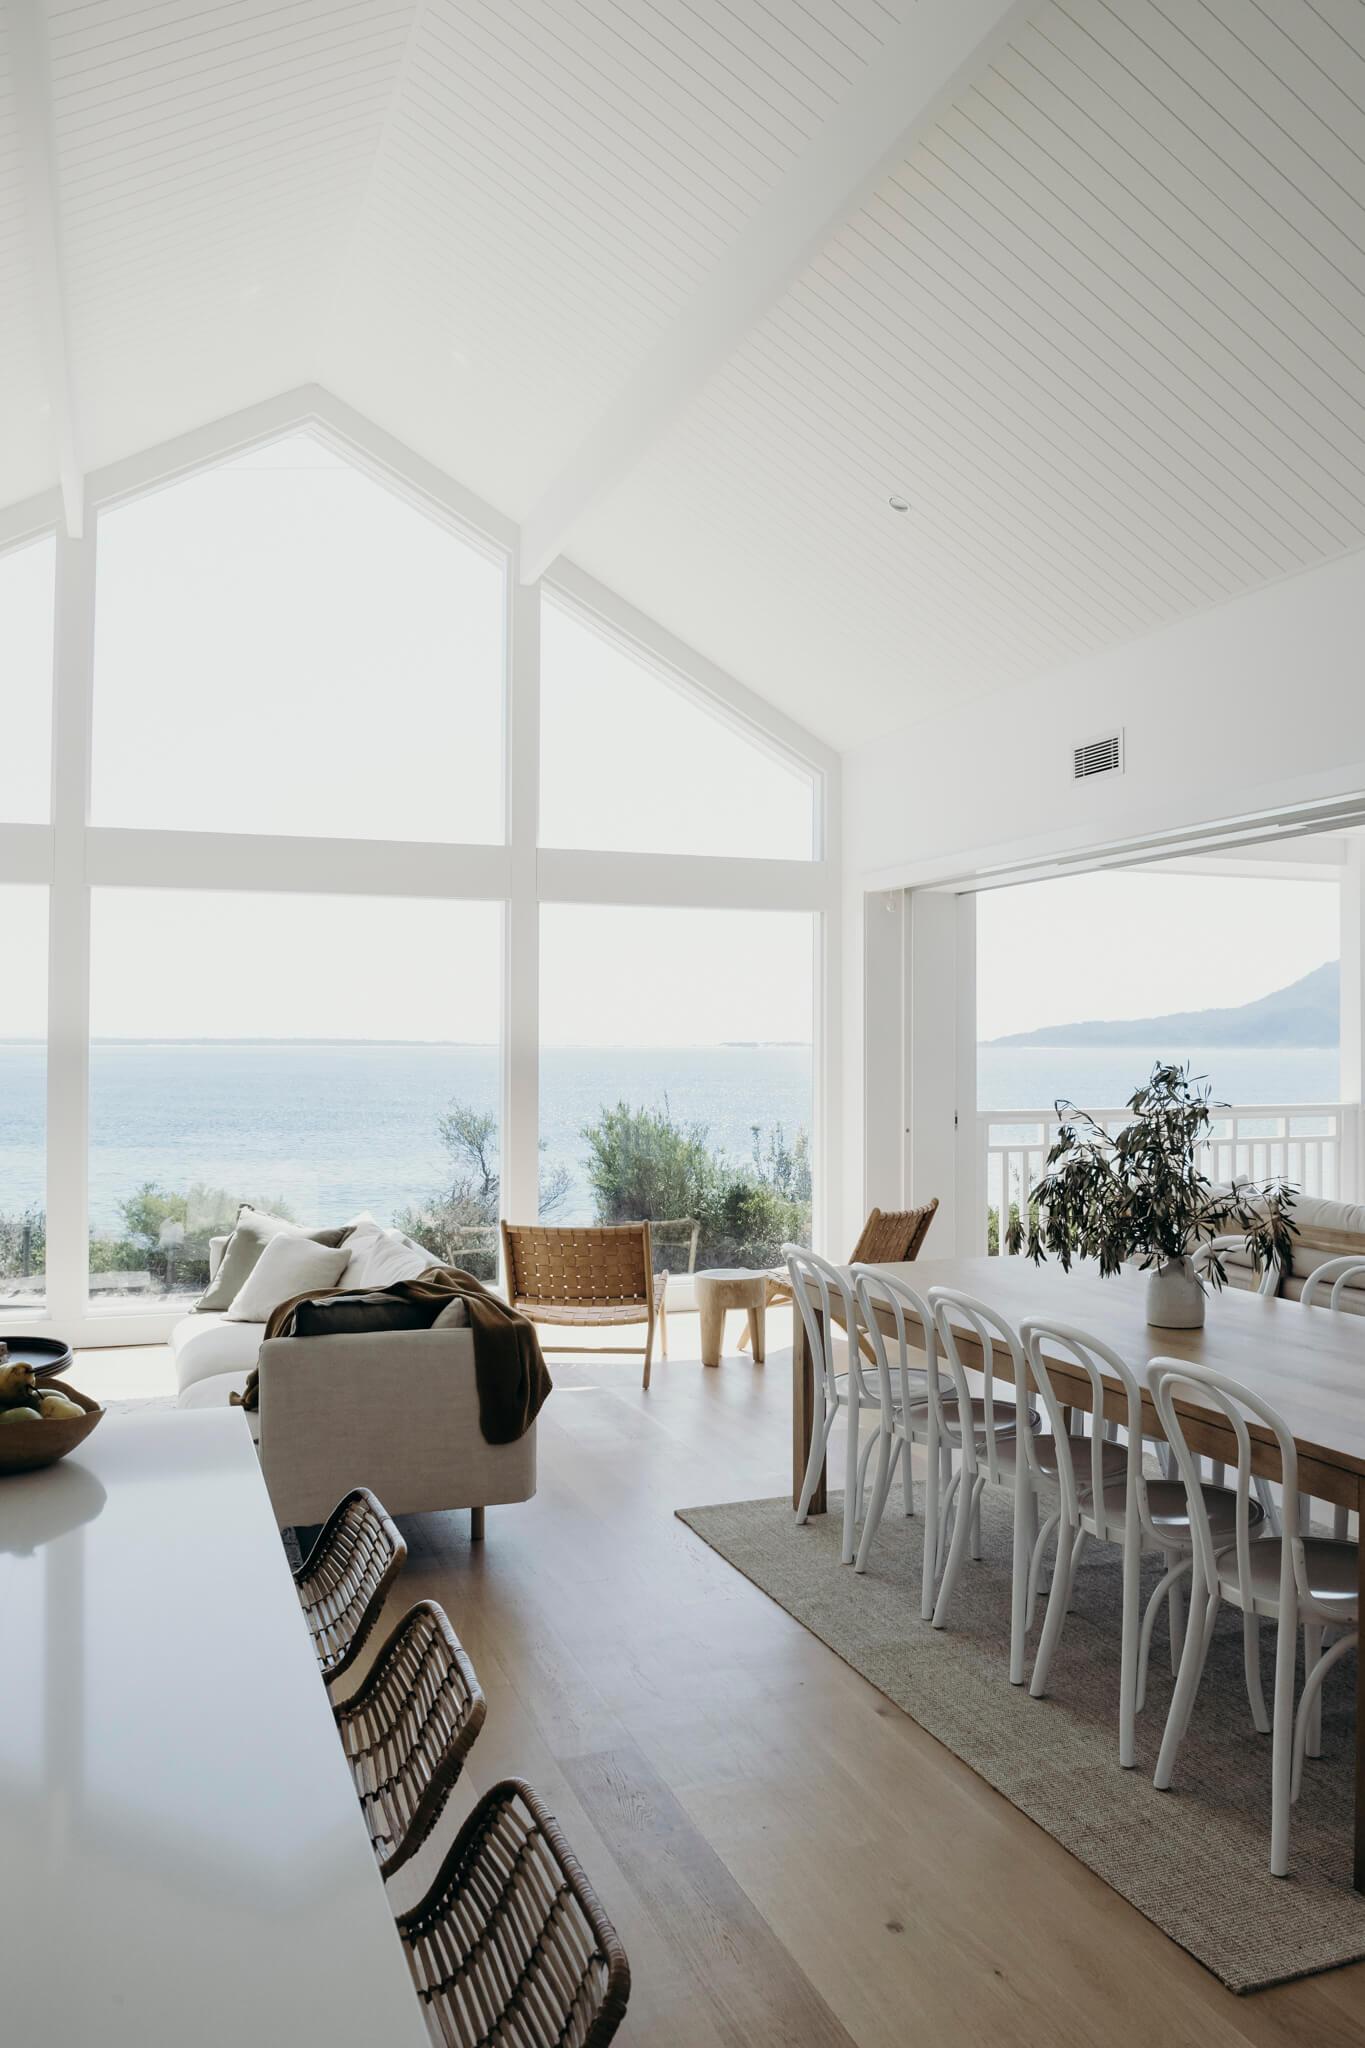 Paul & Paula: natural family beach house in Shoal bay